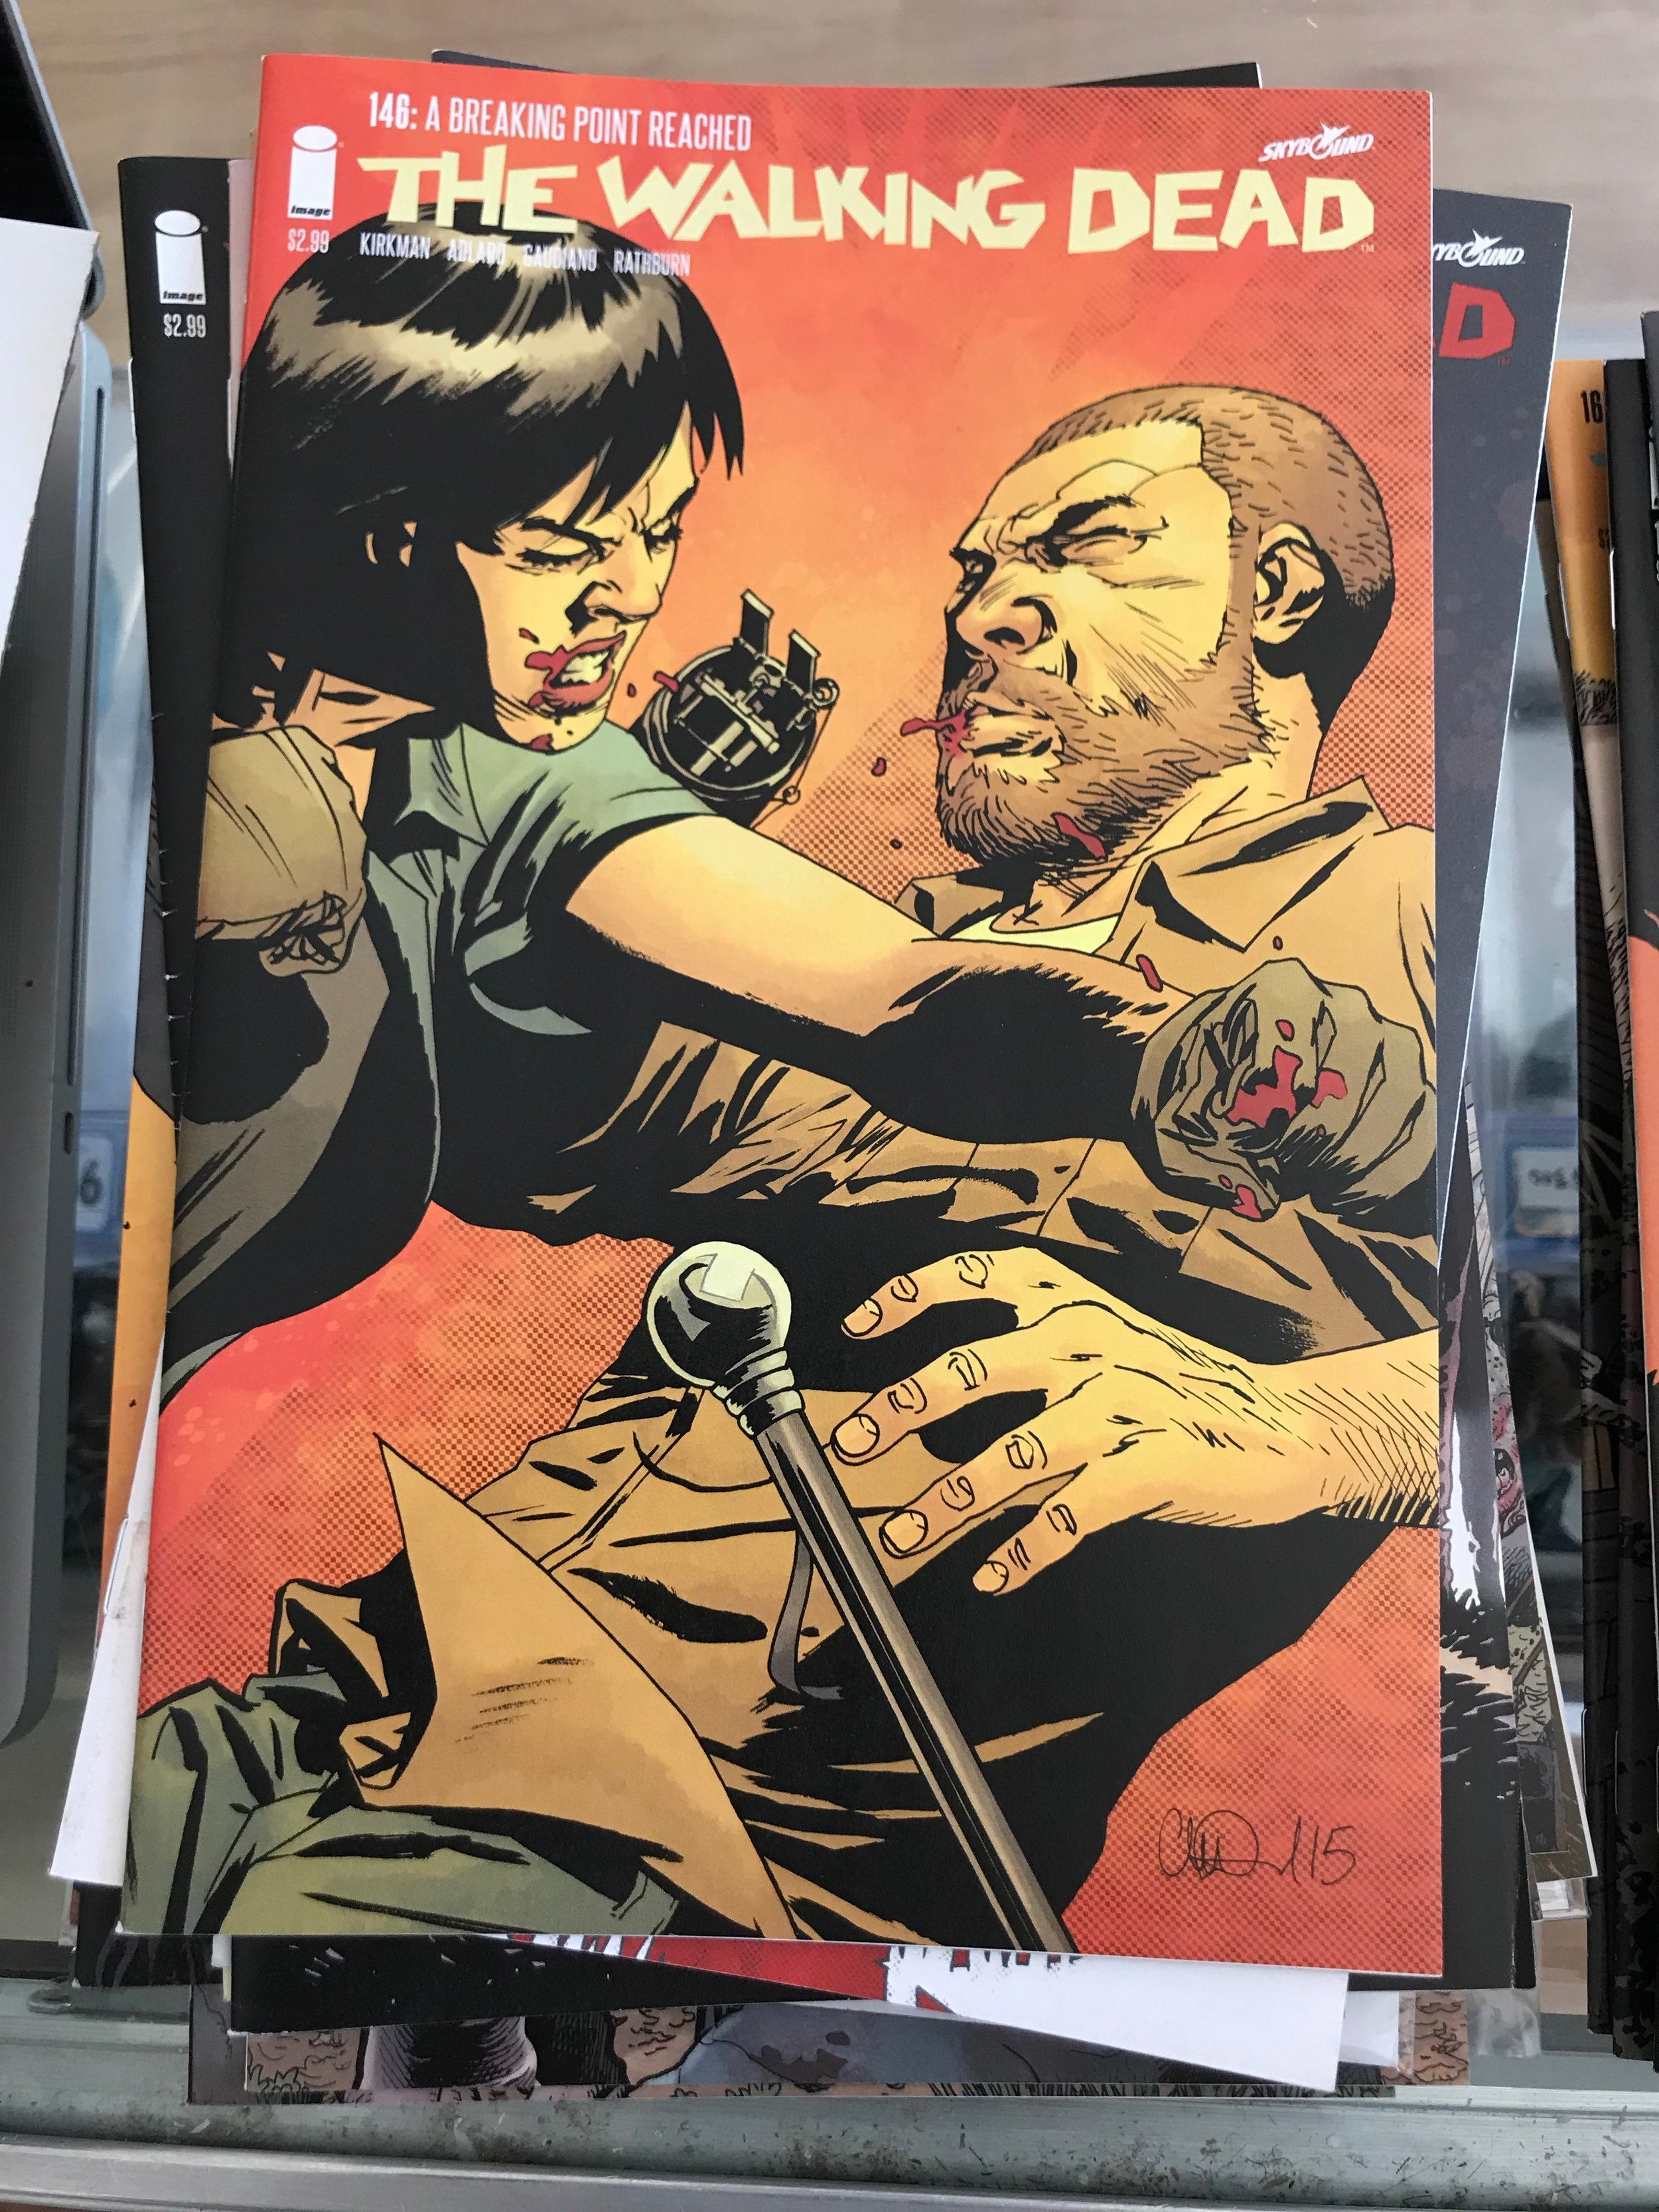 NM The Walking Dead #146 VF+